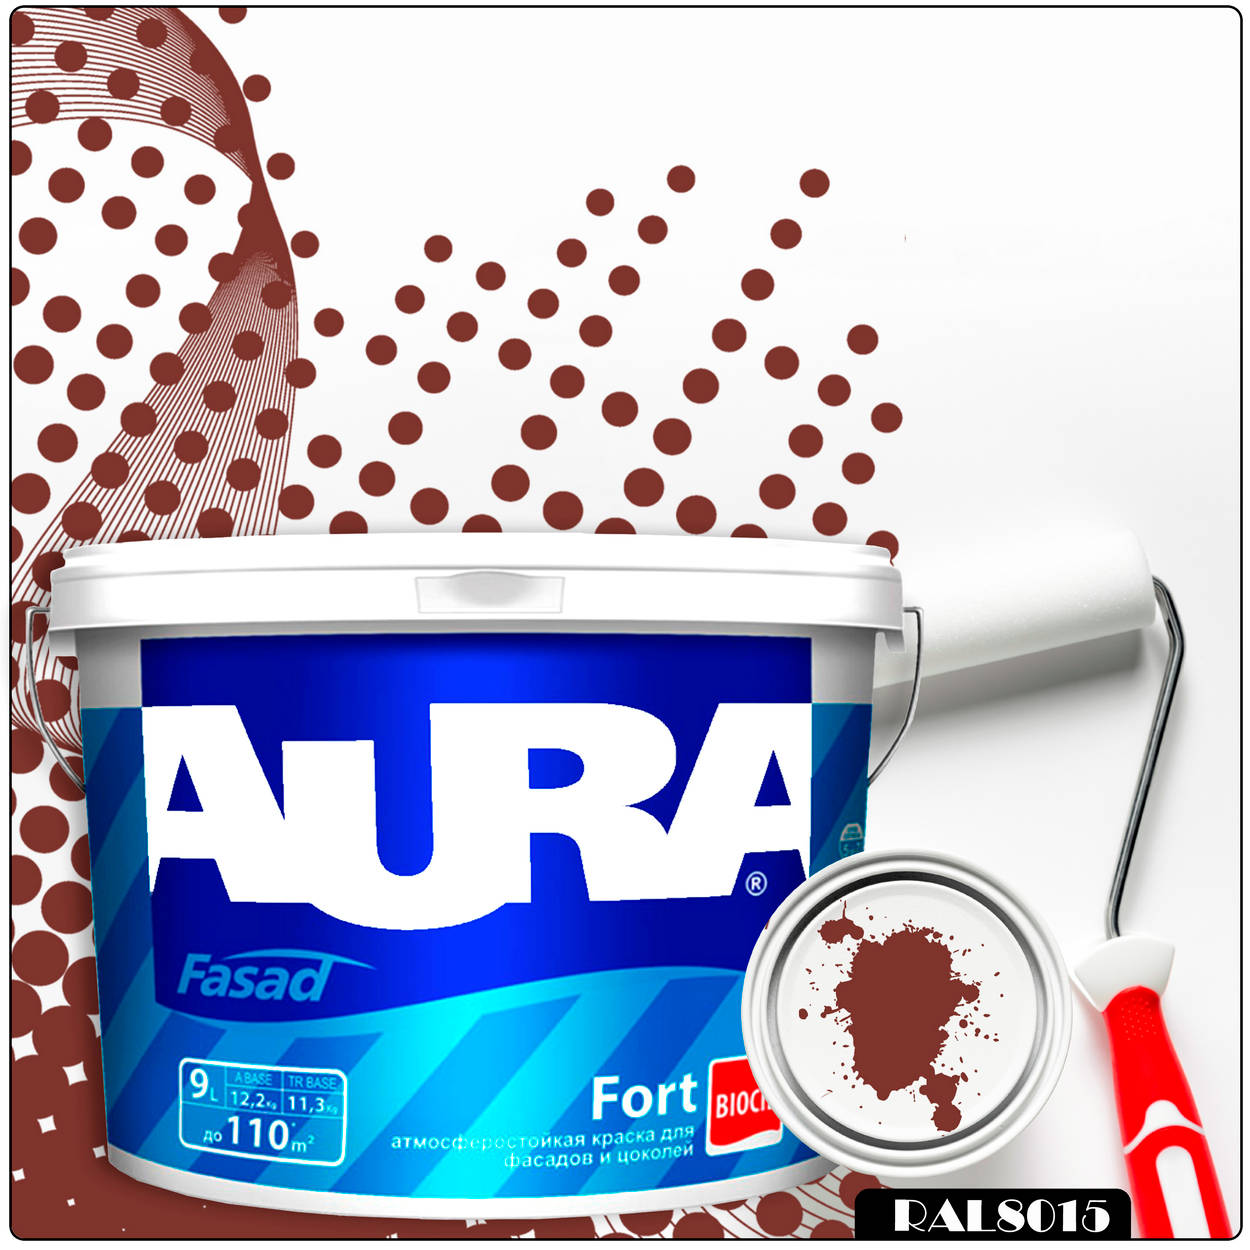 Фото 10 - Краска Aura Fasad Fort, RAL 8015 Коричневый каштан, латексная, матовая, для фасада и цоколей, 9л, Аура.